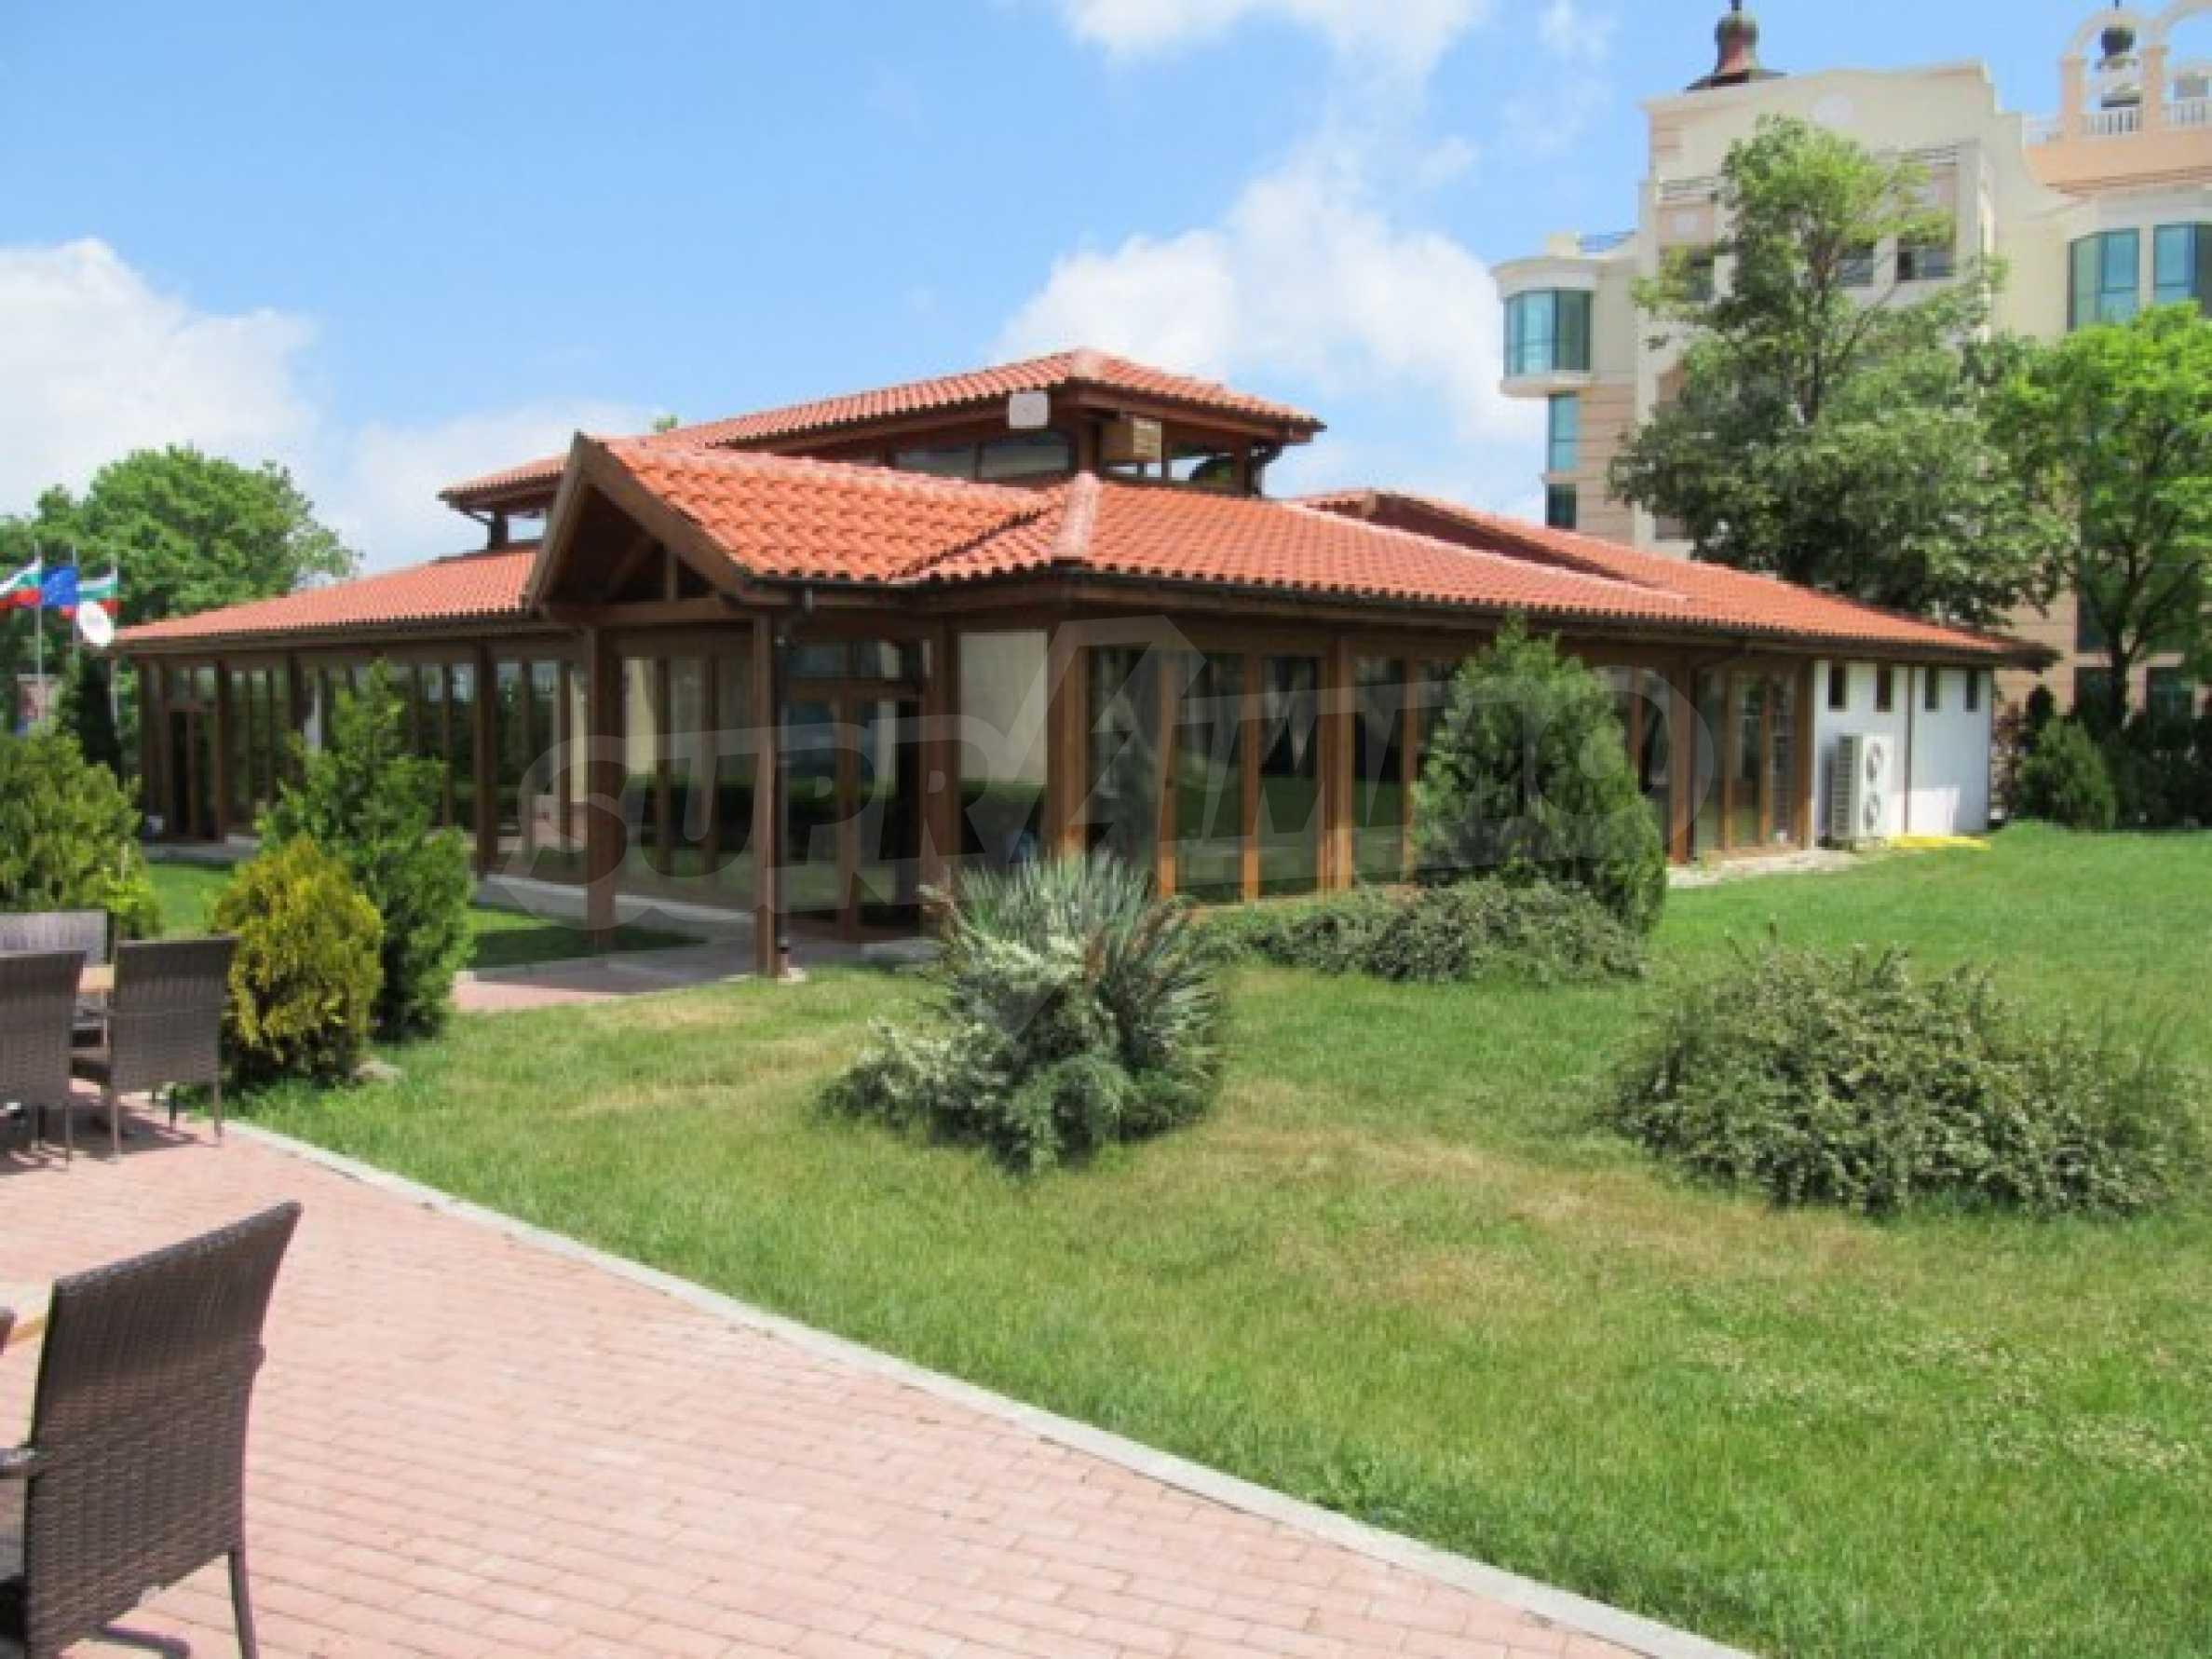 Тристаен апартамент за продажба в Поморие 26